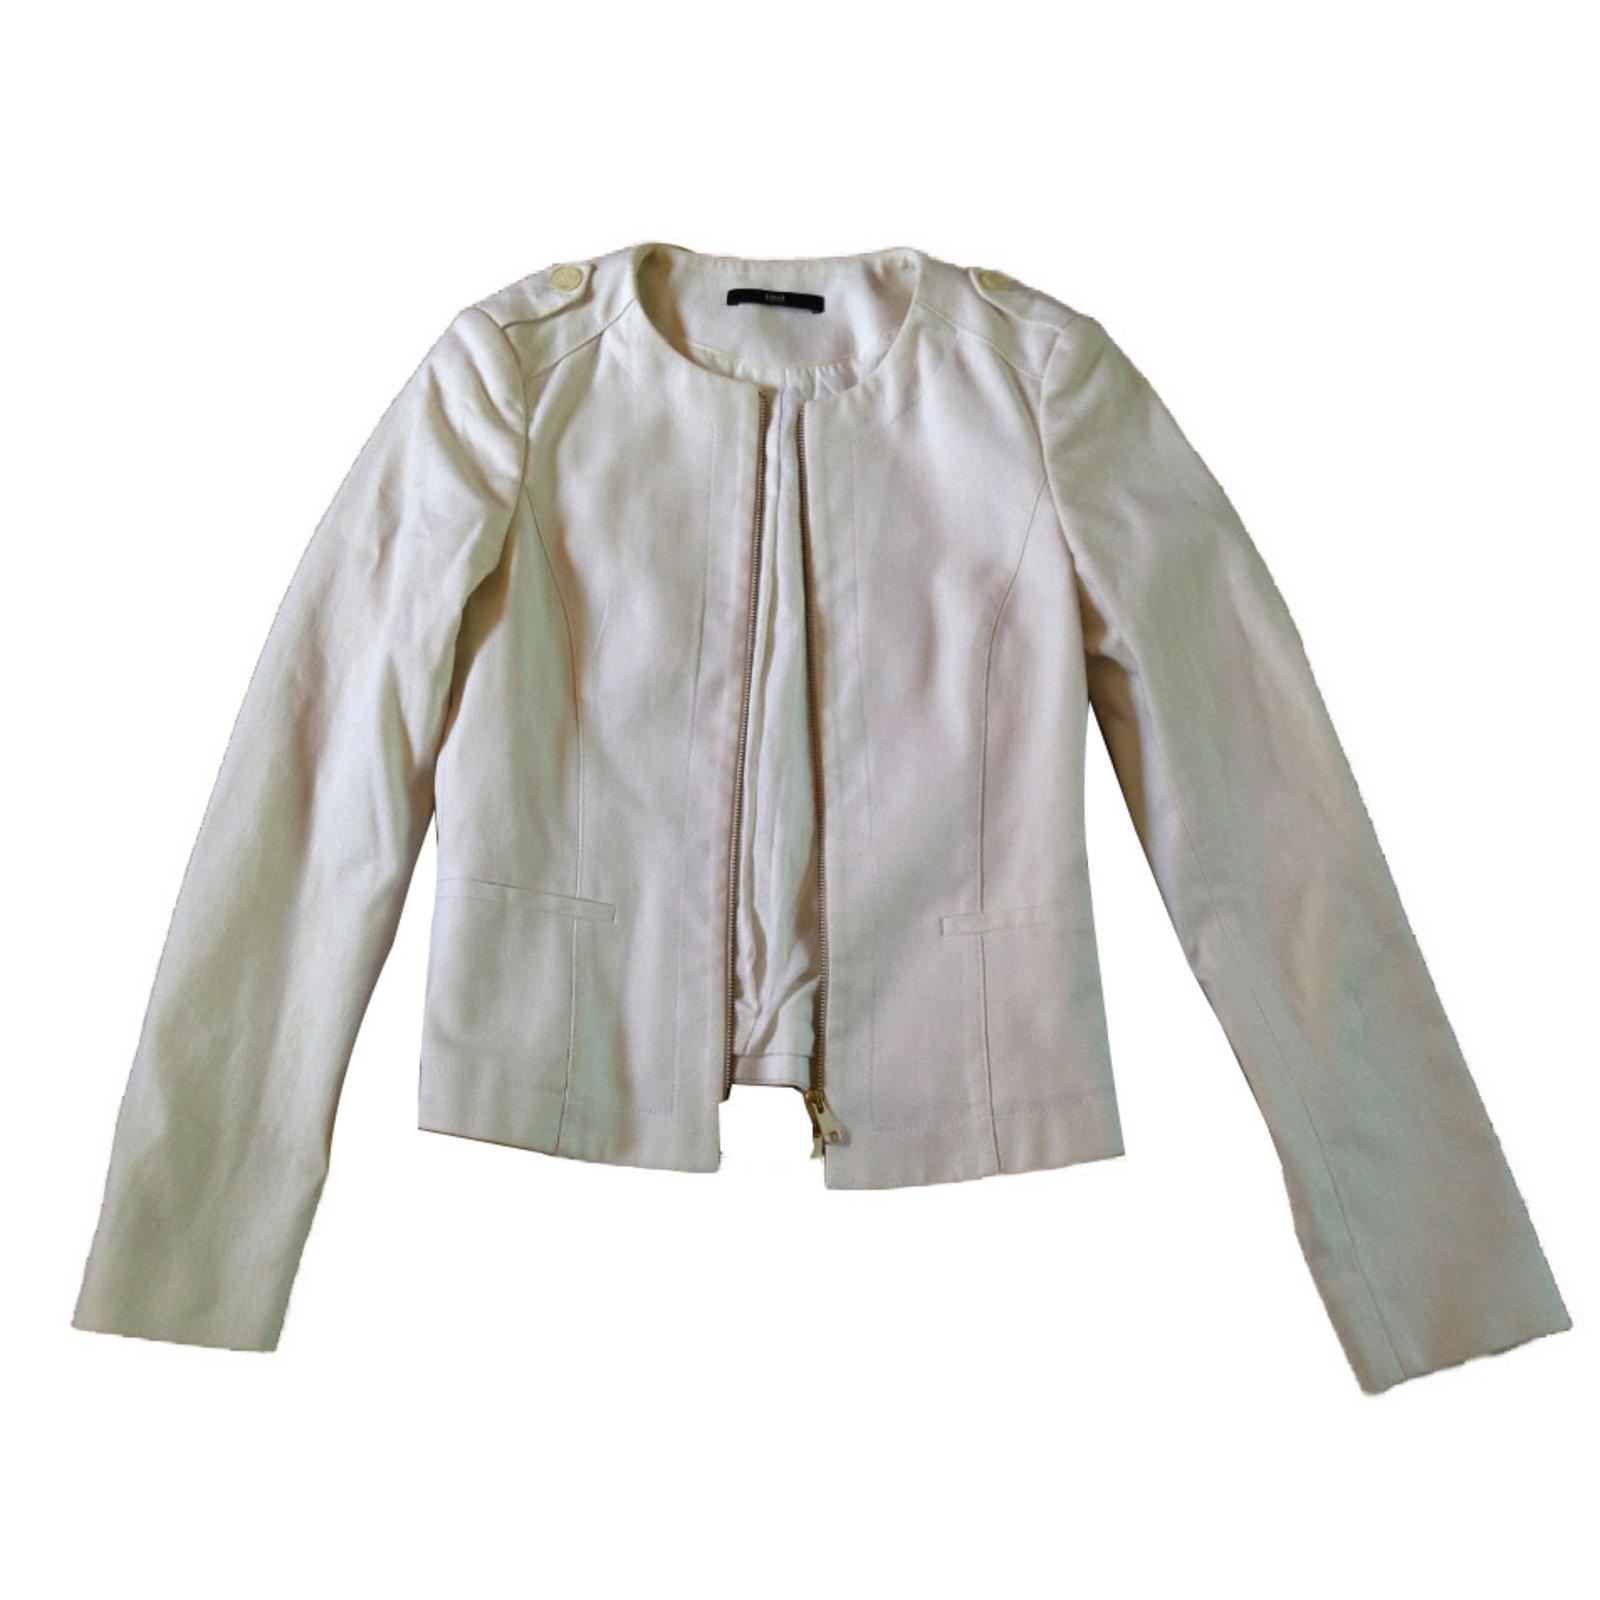 6c9175a81 Hugo Boss Jacket Jackets Cotton White ref.69913 - Joli Closet